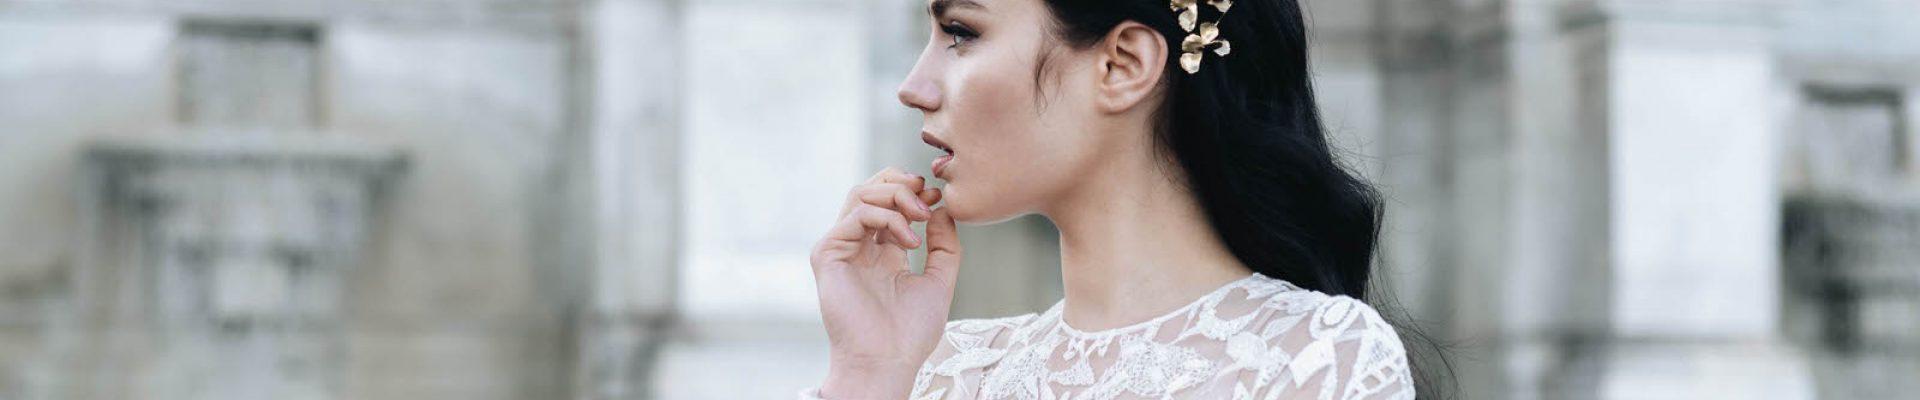 Bridal editorial-Bridal-pre-wedding-make-up-service-for-bride-make-up-artist-tina-derkse-savourbytina-3